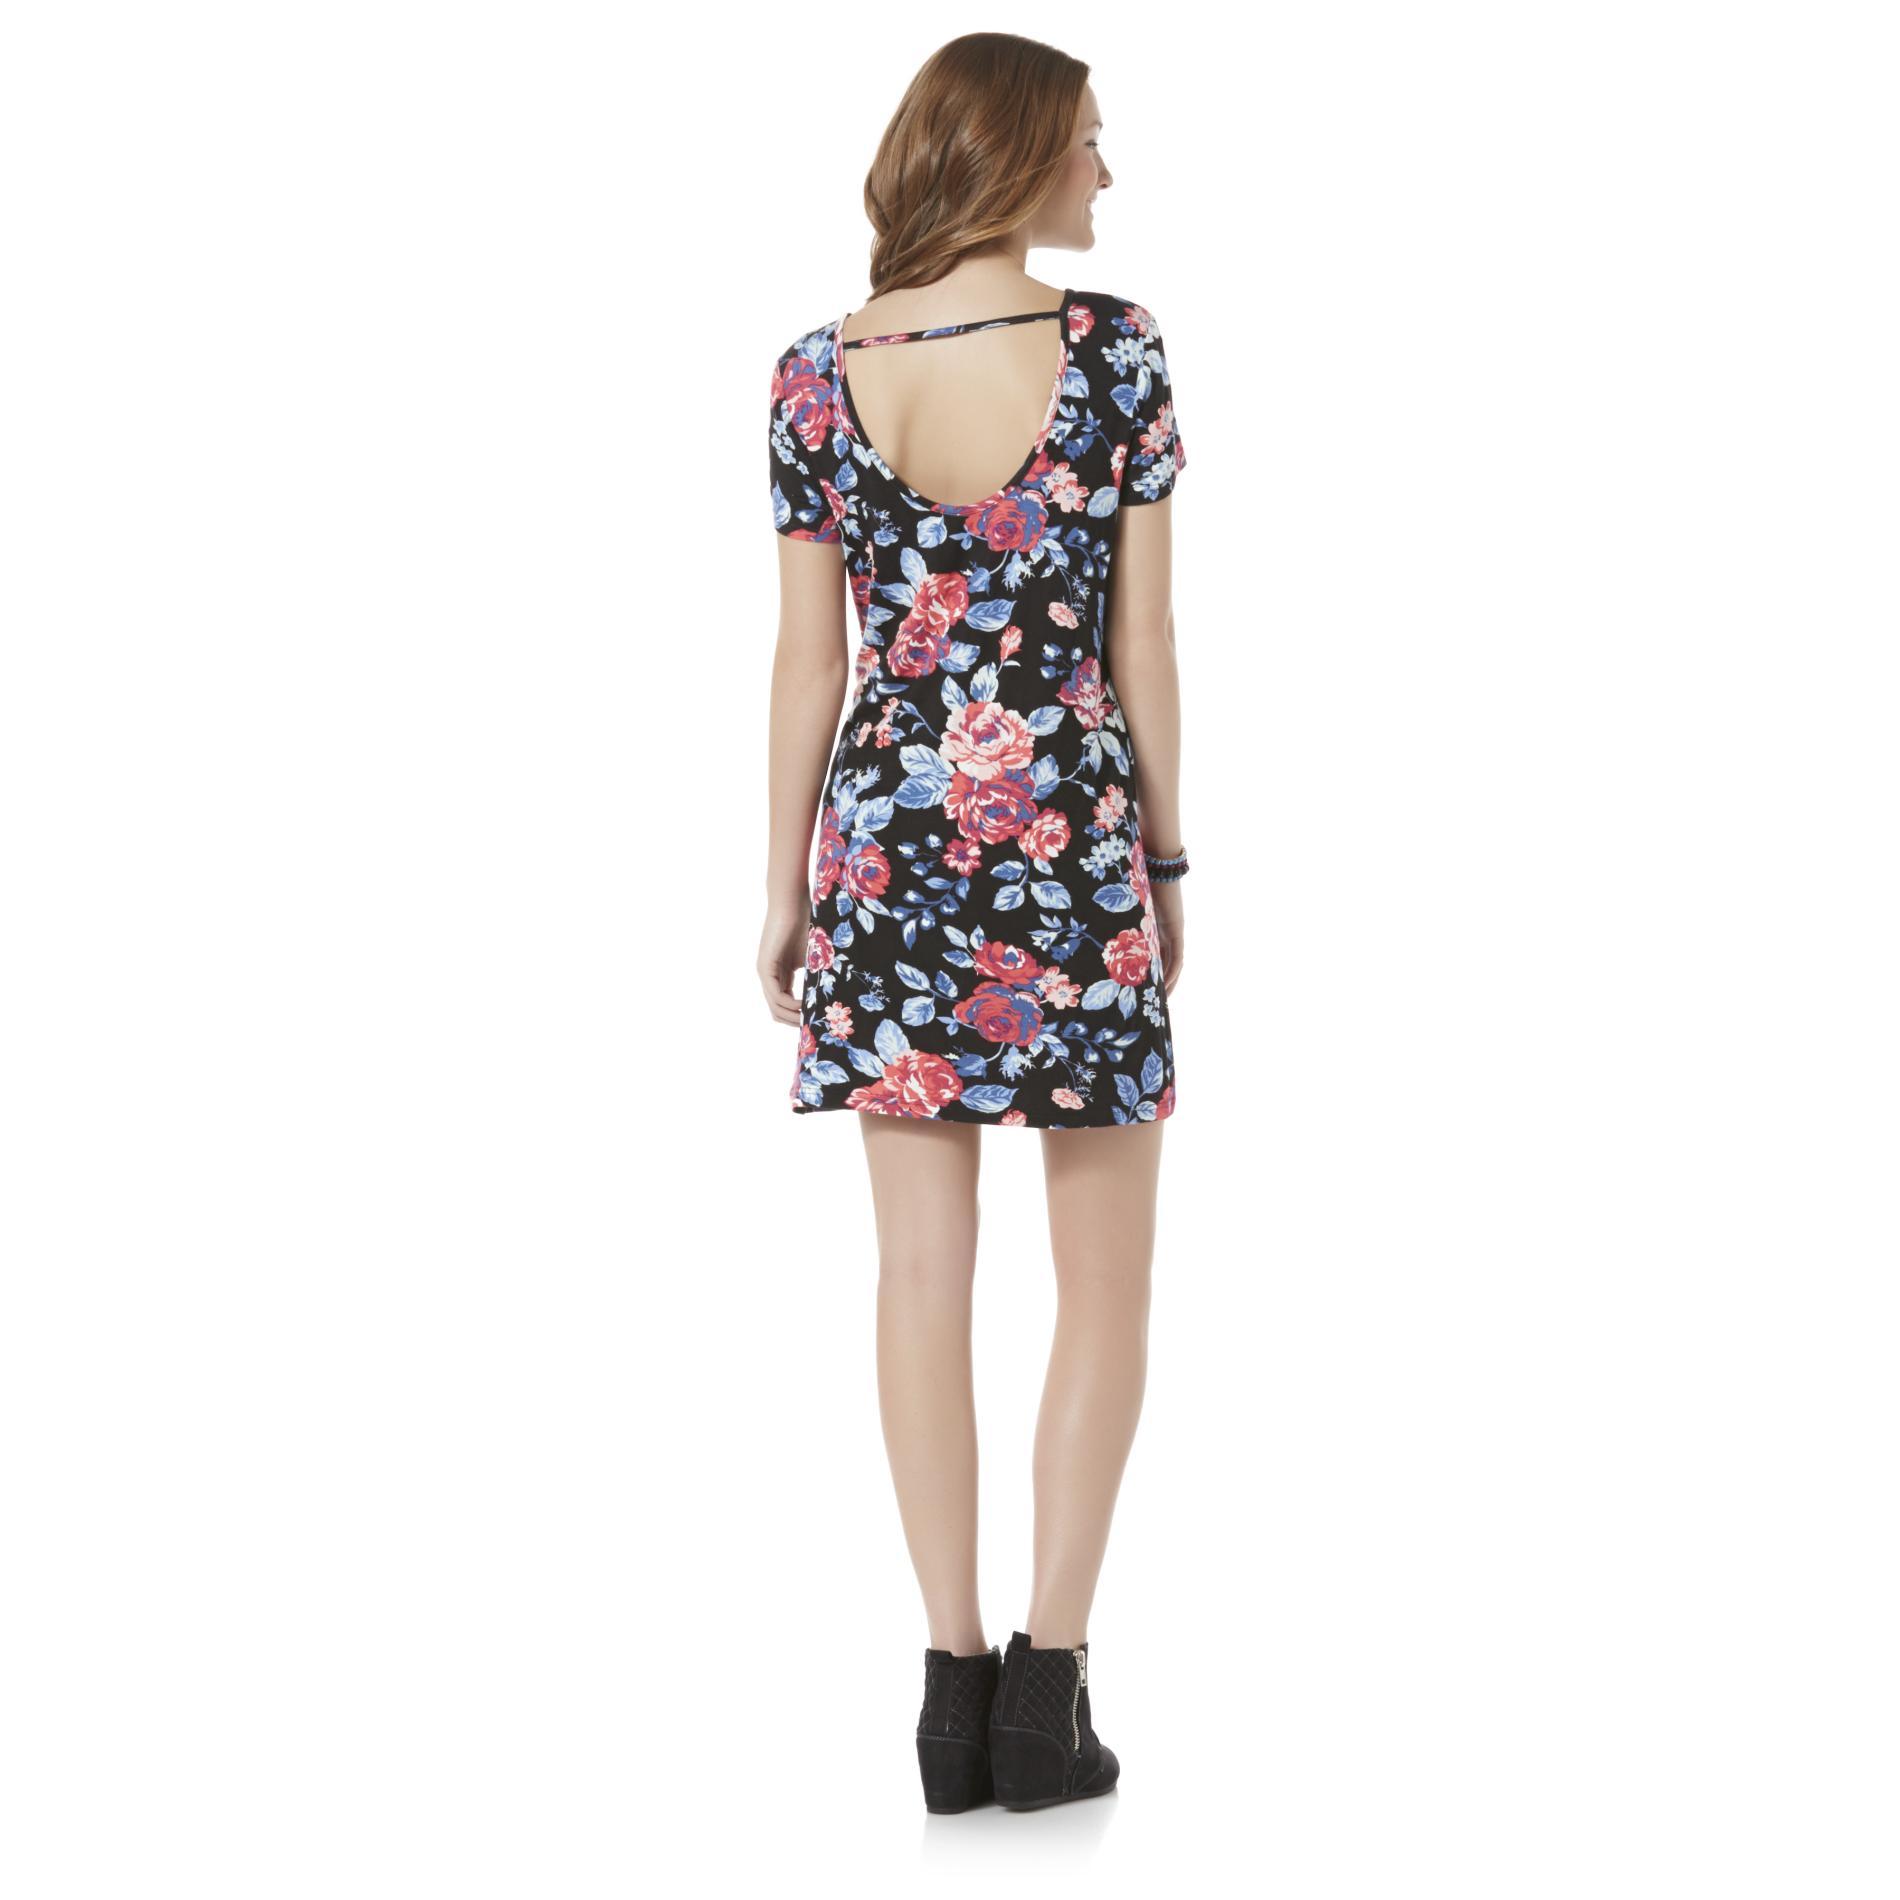 Joe Boxer Junior's T-Shirt Dress - Floral